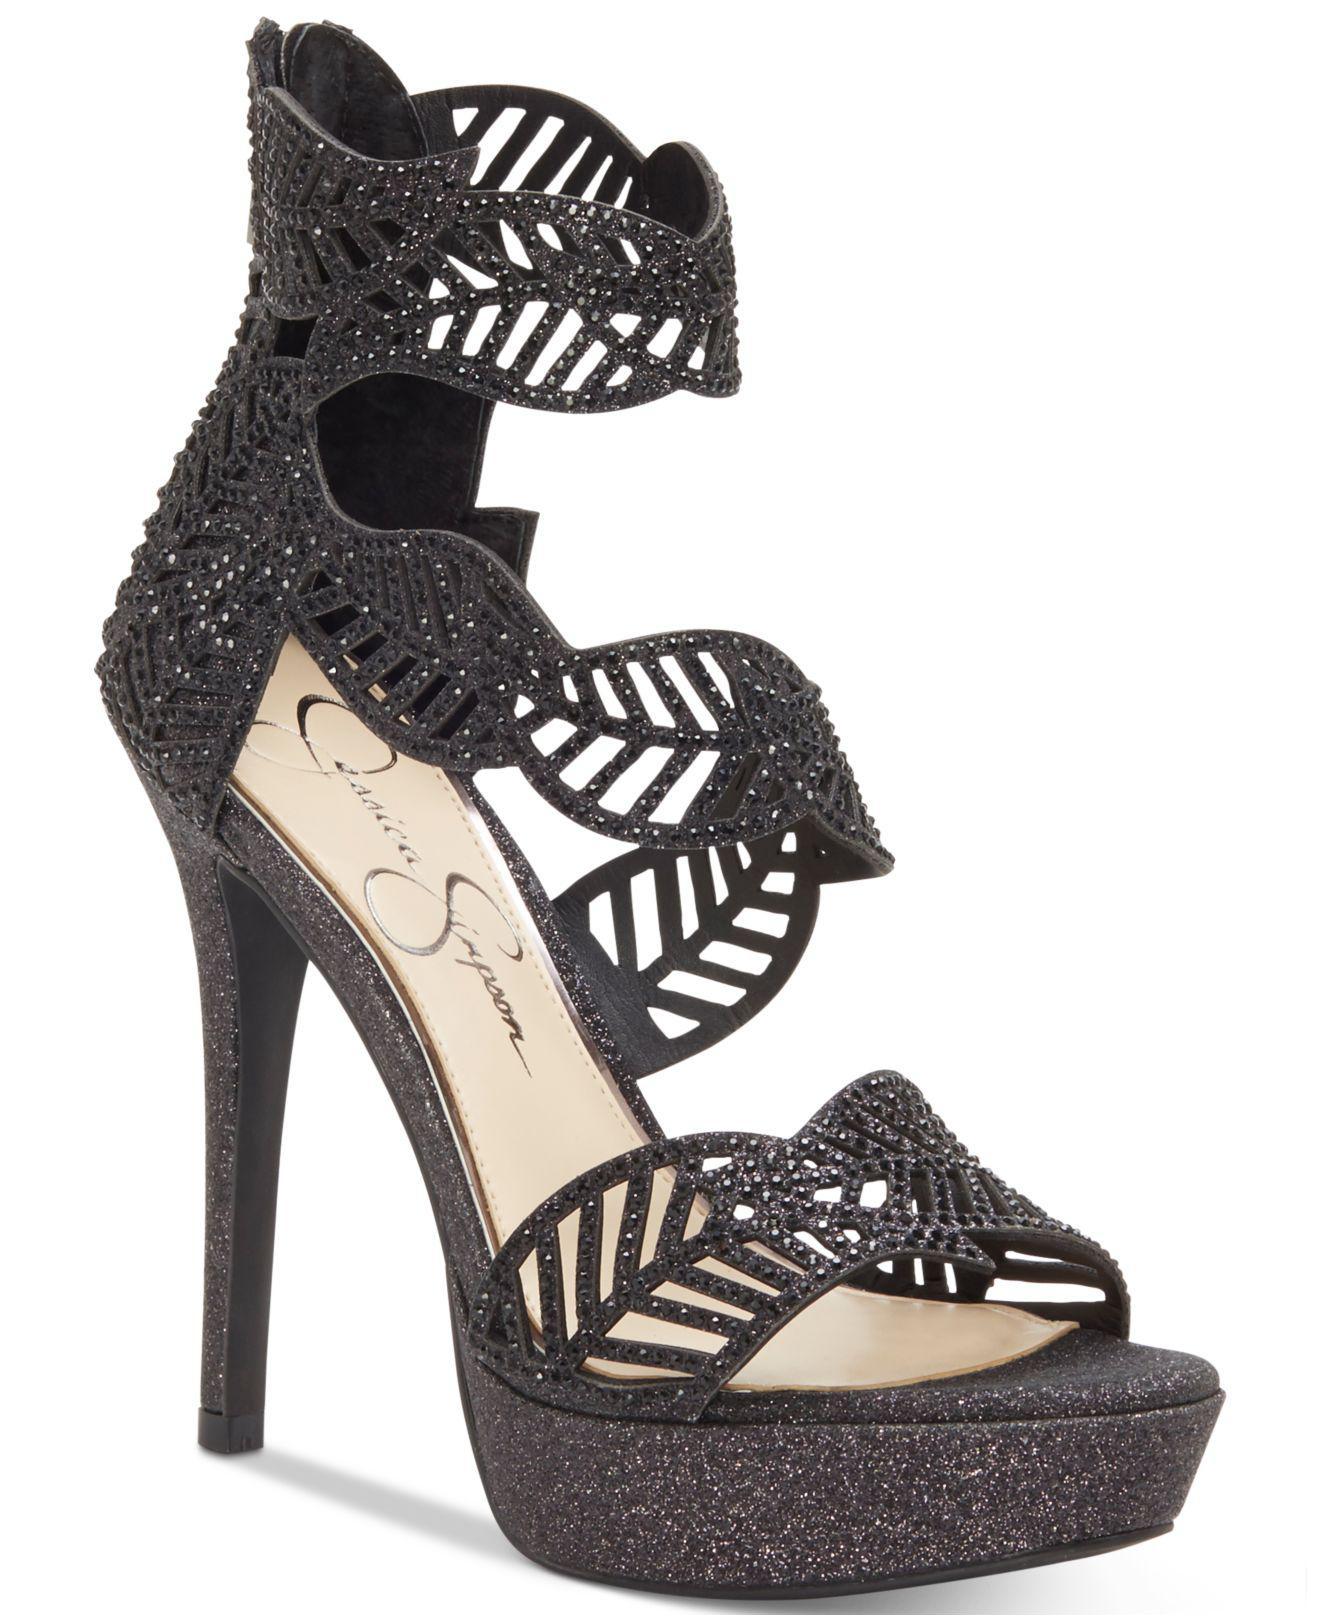 21666d4c567 Lyst - Jessica Simpson Bonilynn Platform Dress Sandals in Black